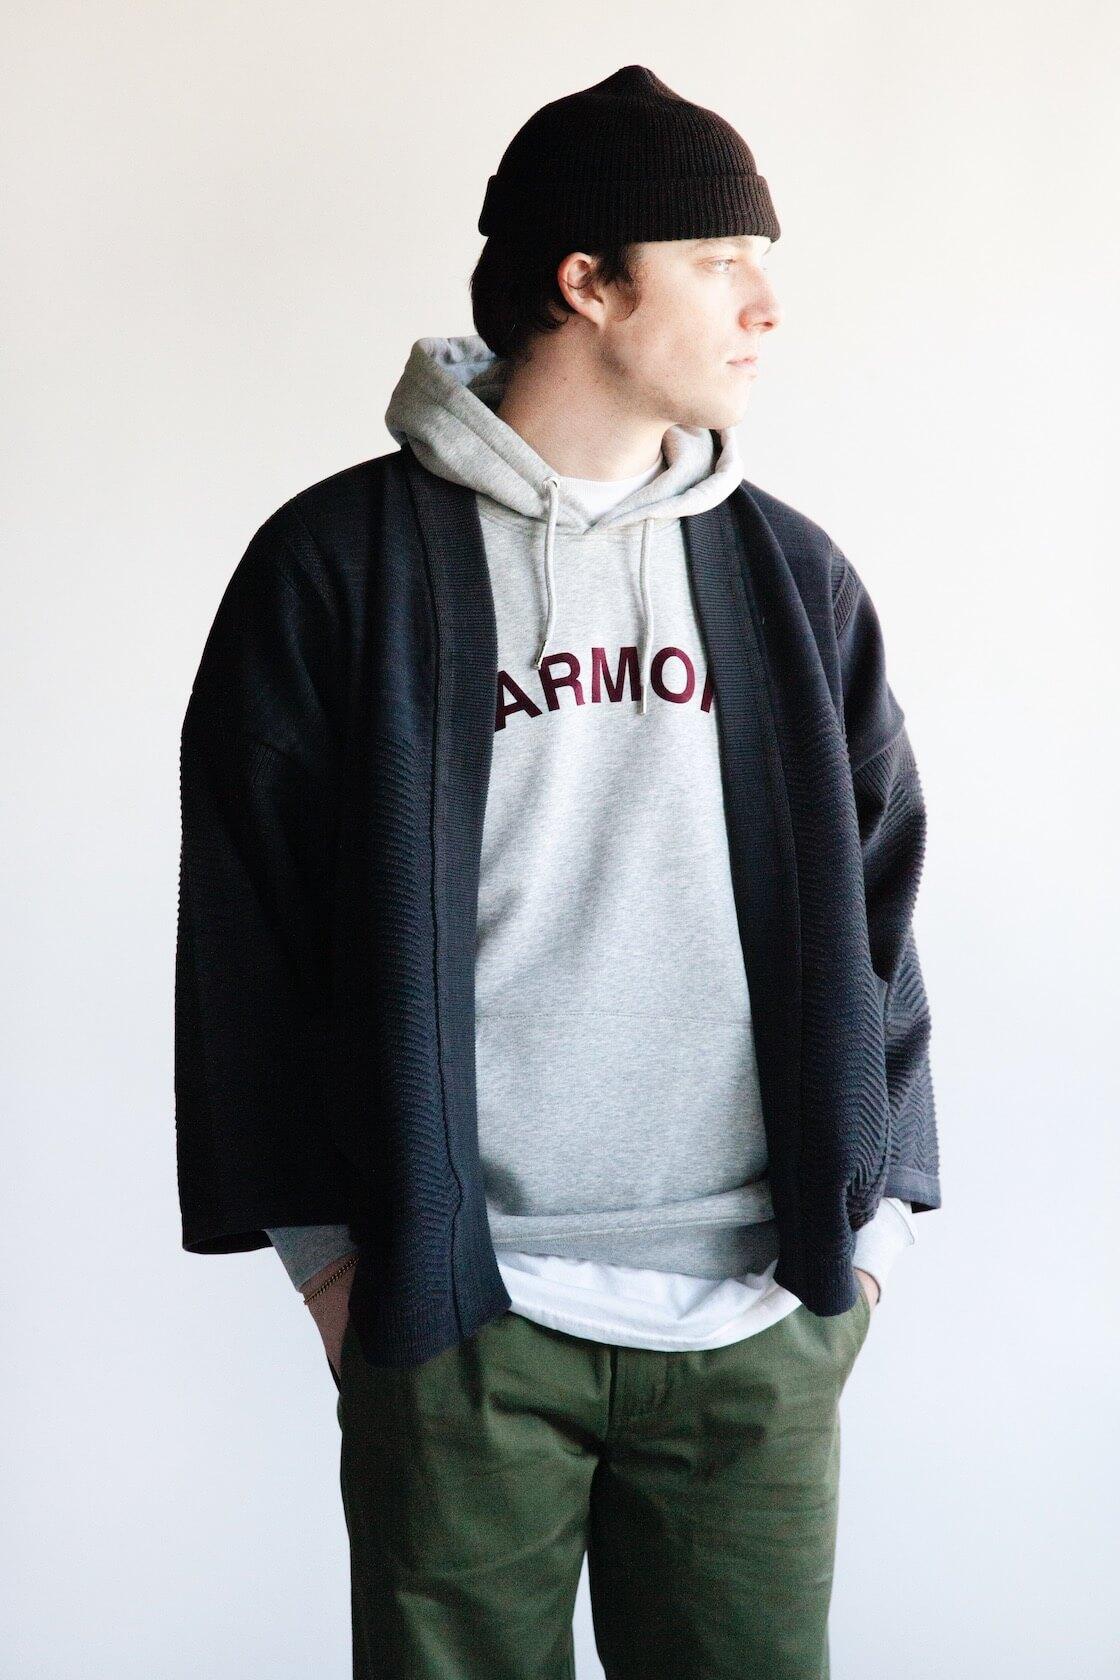 Shunto Hanten Knit from Yashiki, Sany Velour Sweatshirt from Harmony, Military Chinos from Universal Works on body